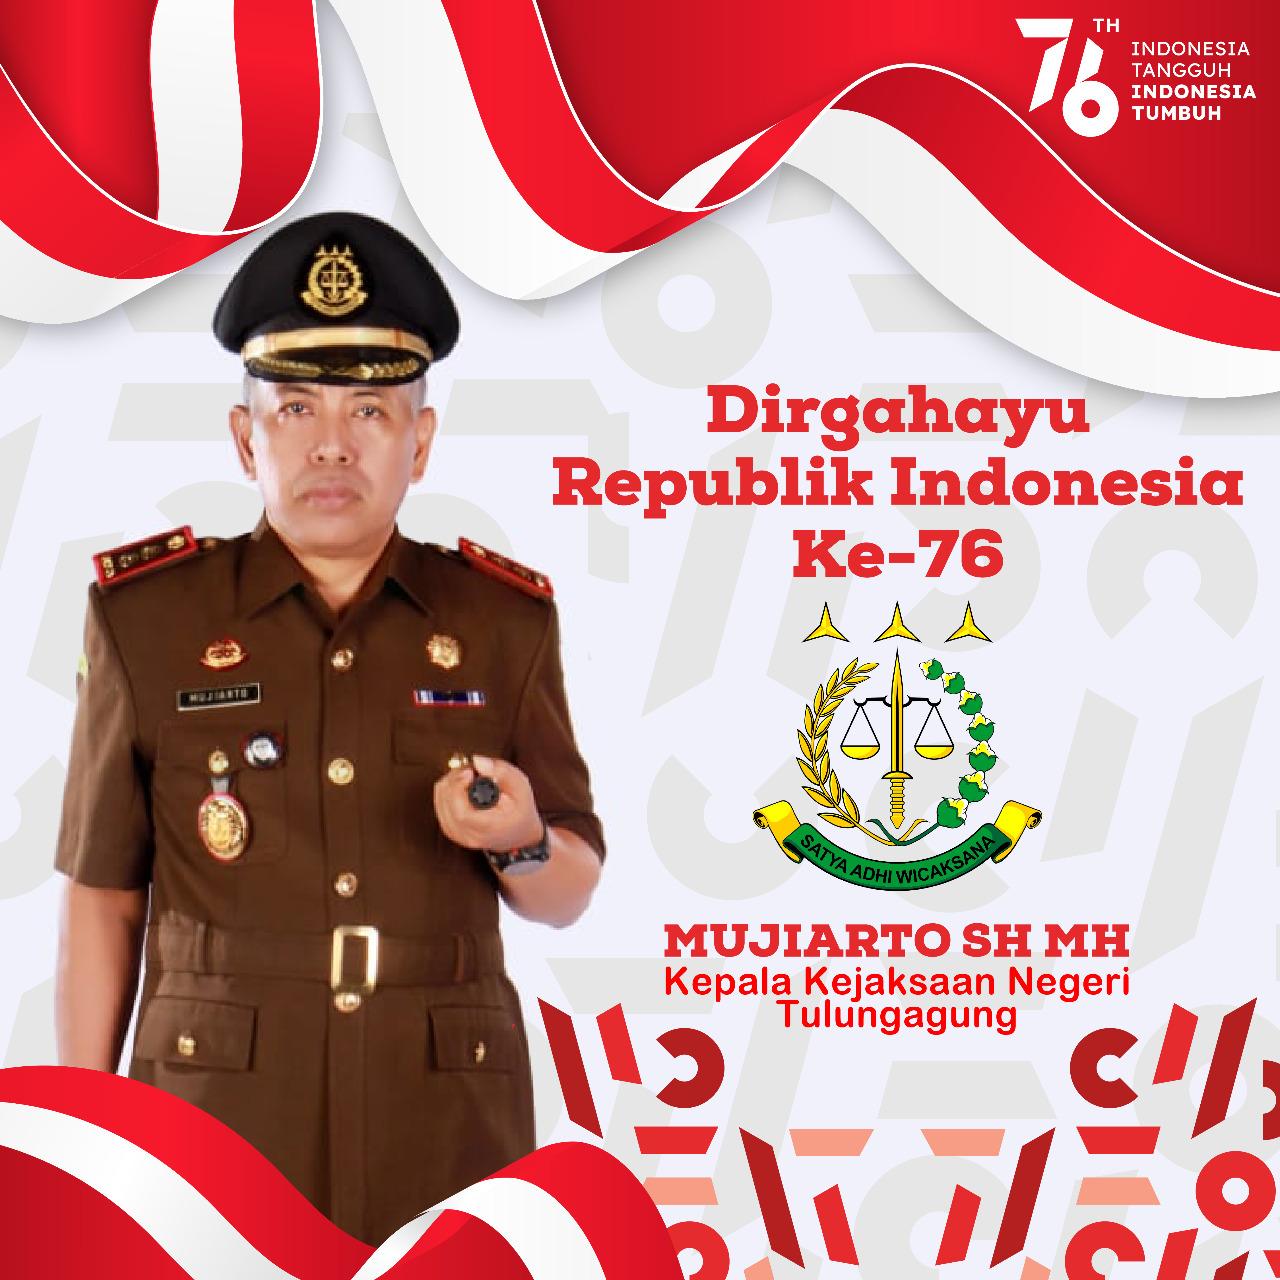 https://risetcdn.jatimtimes.com/images/2021/08/16/kejaksaan-tulungagung8ad700d8895f2b95.jpg